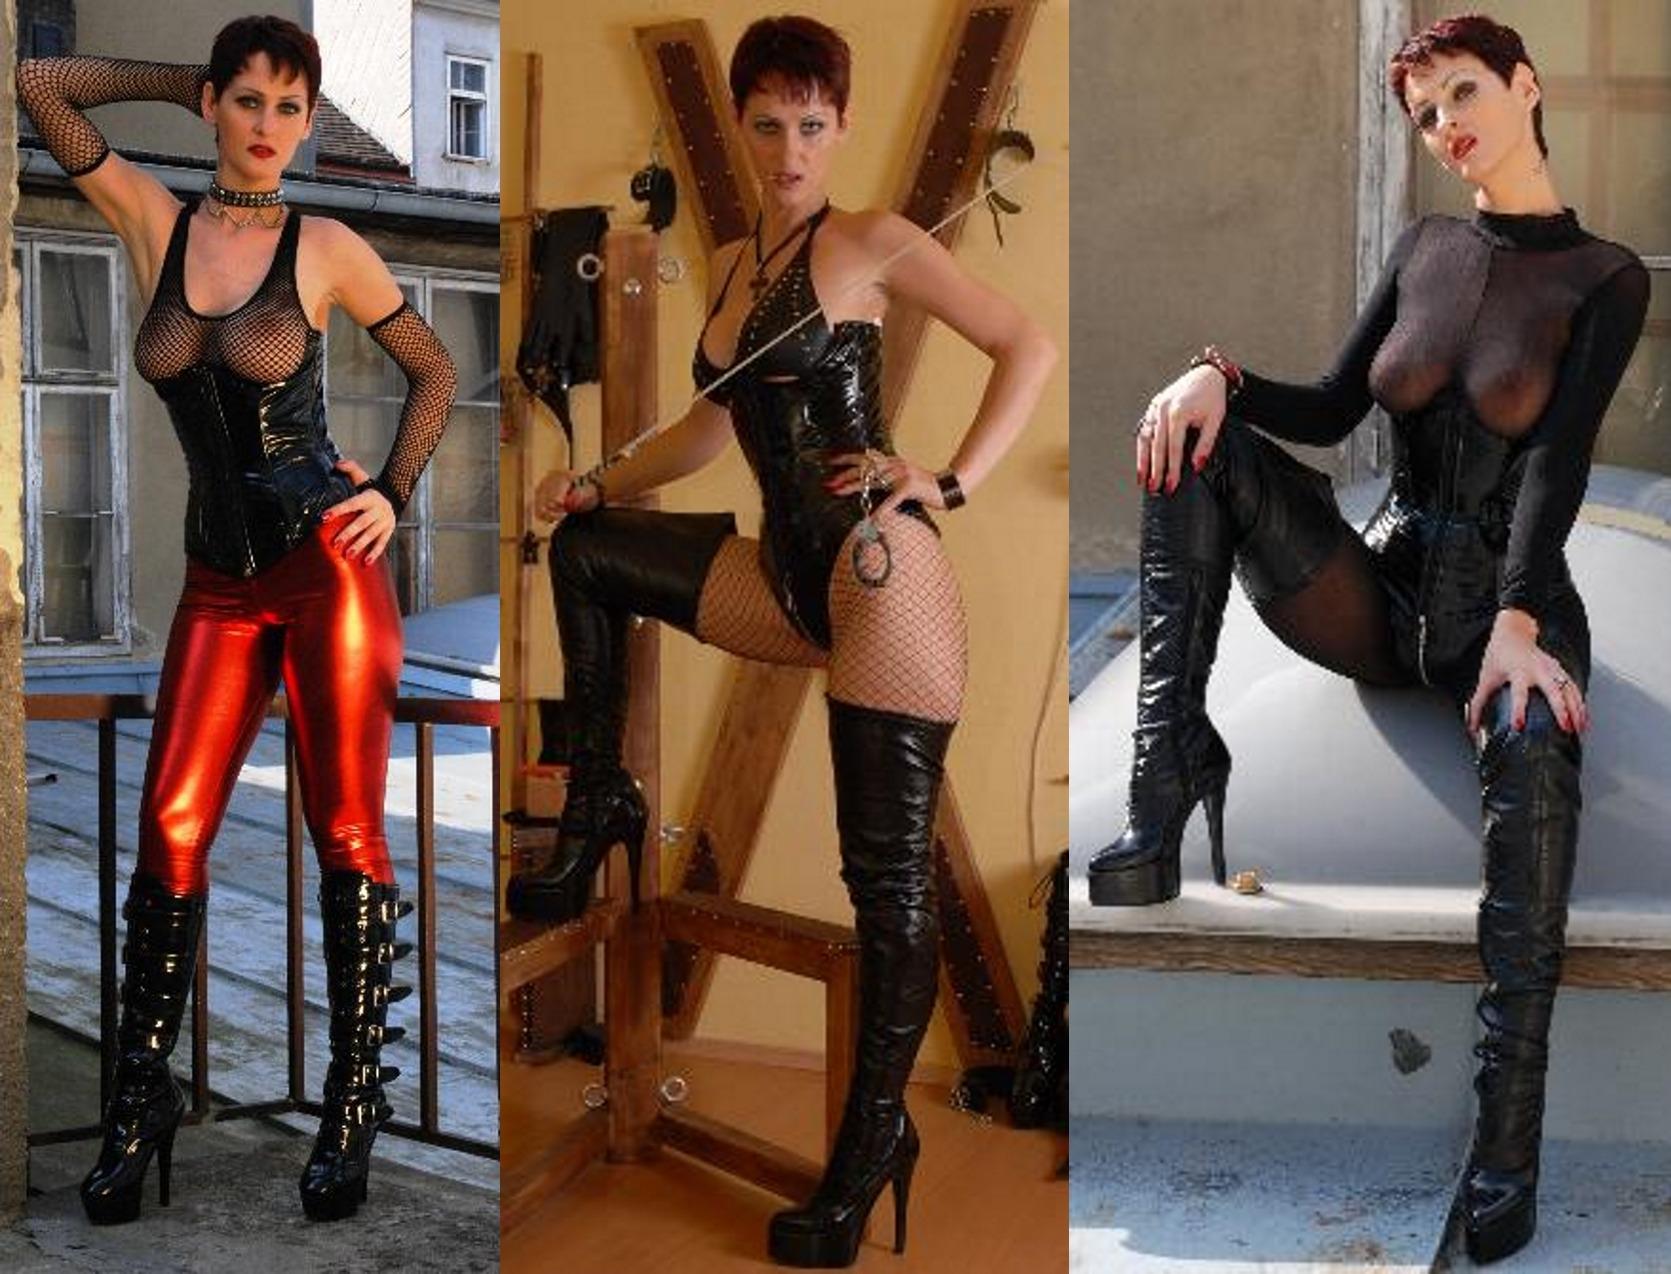 Nina Desire in domina clothes in Vienna